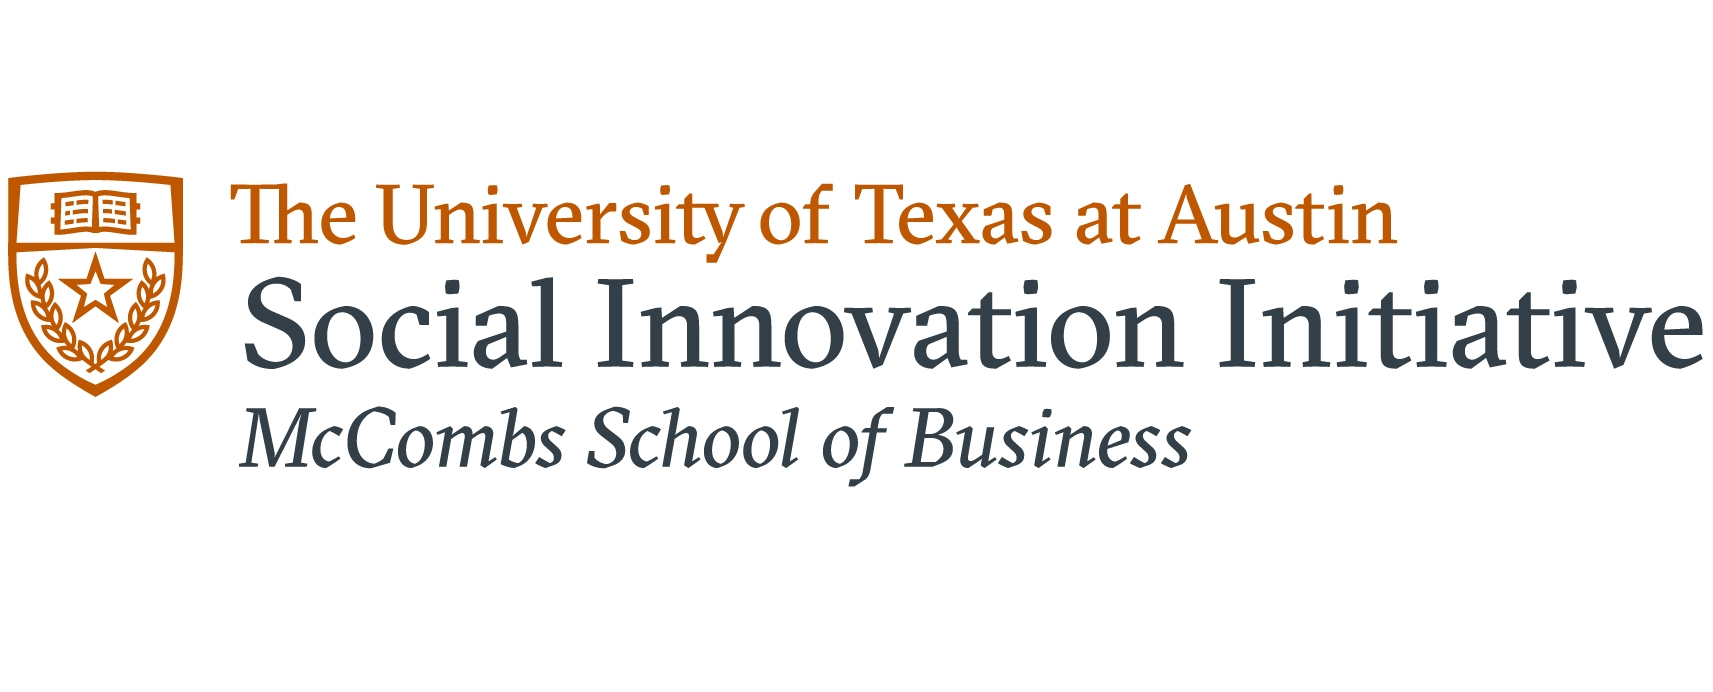 McCombs_RGB_Social_Innovation_Initiative.jpg